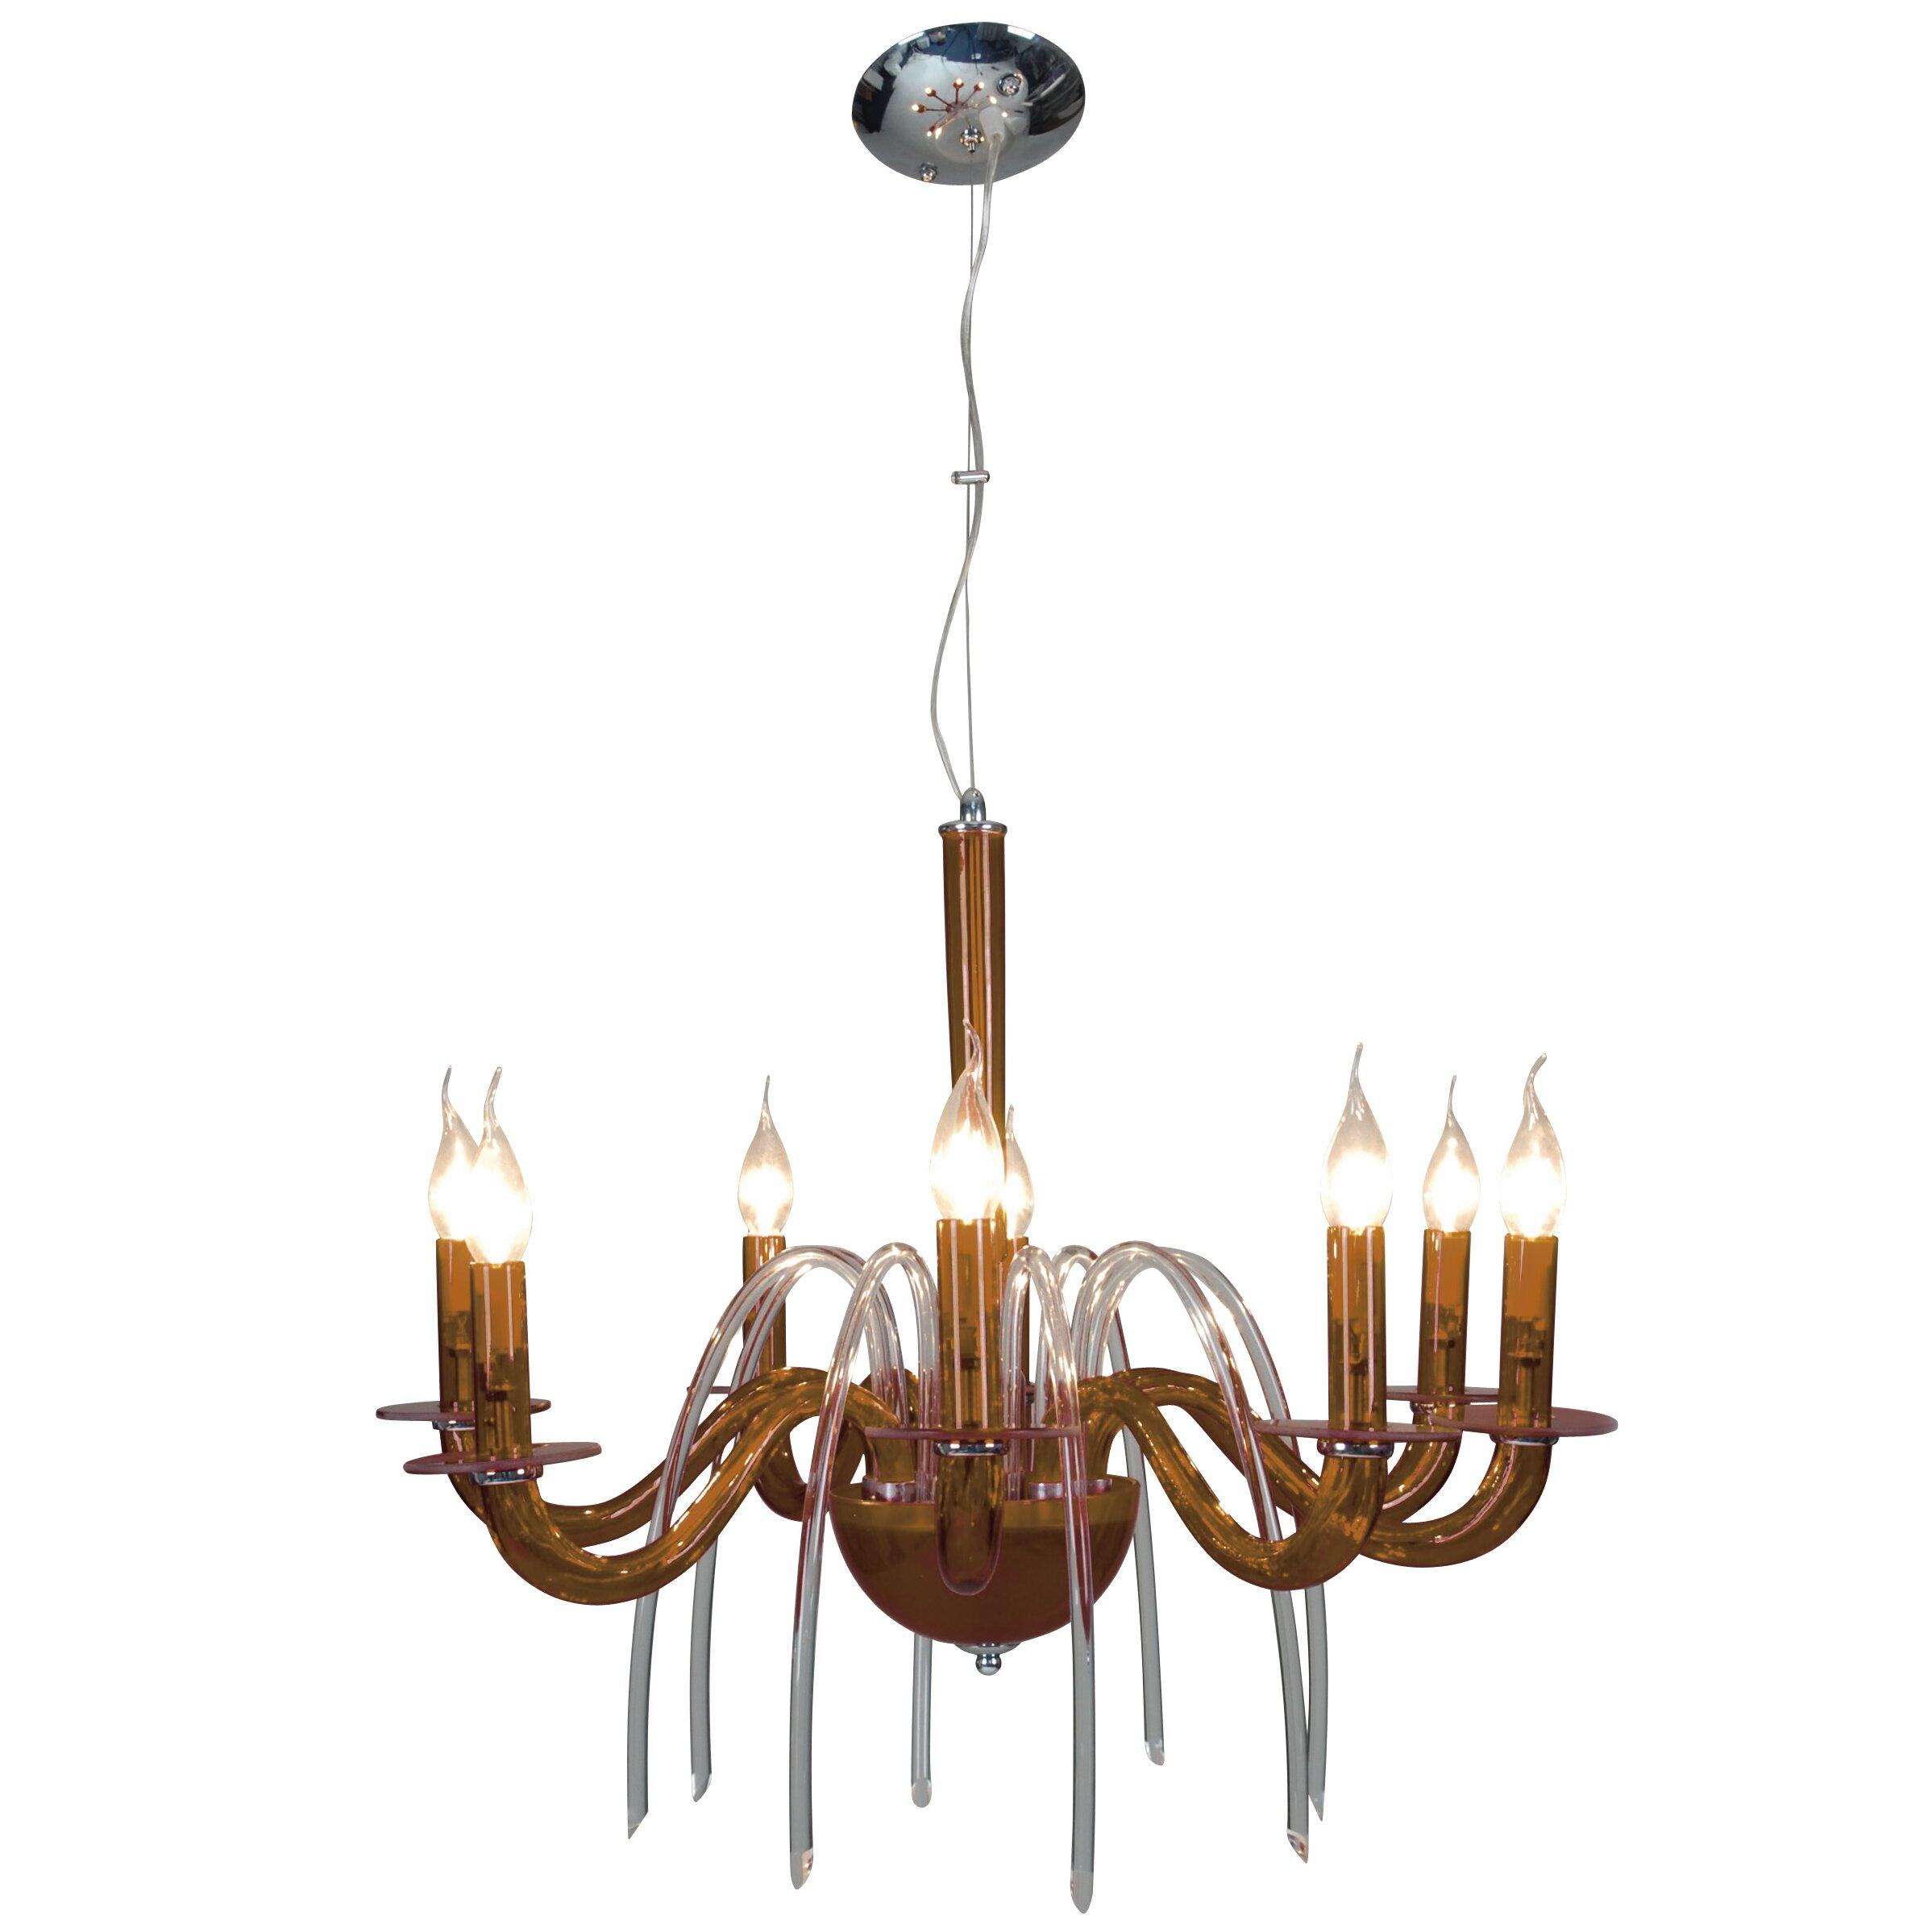 naeve leuchten decorative 8 light candle style chandelier wayfair uk